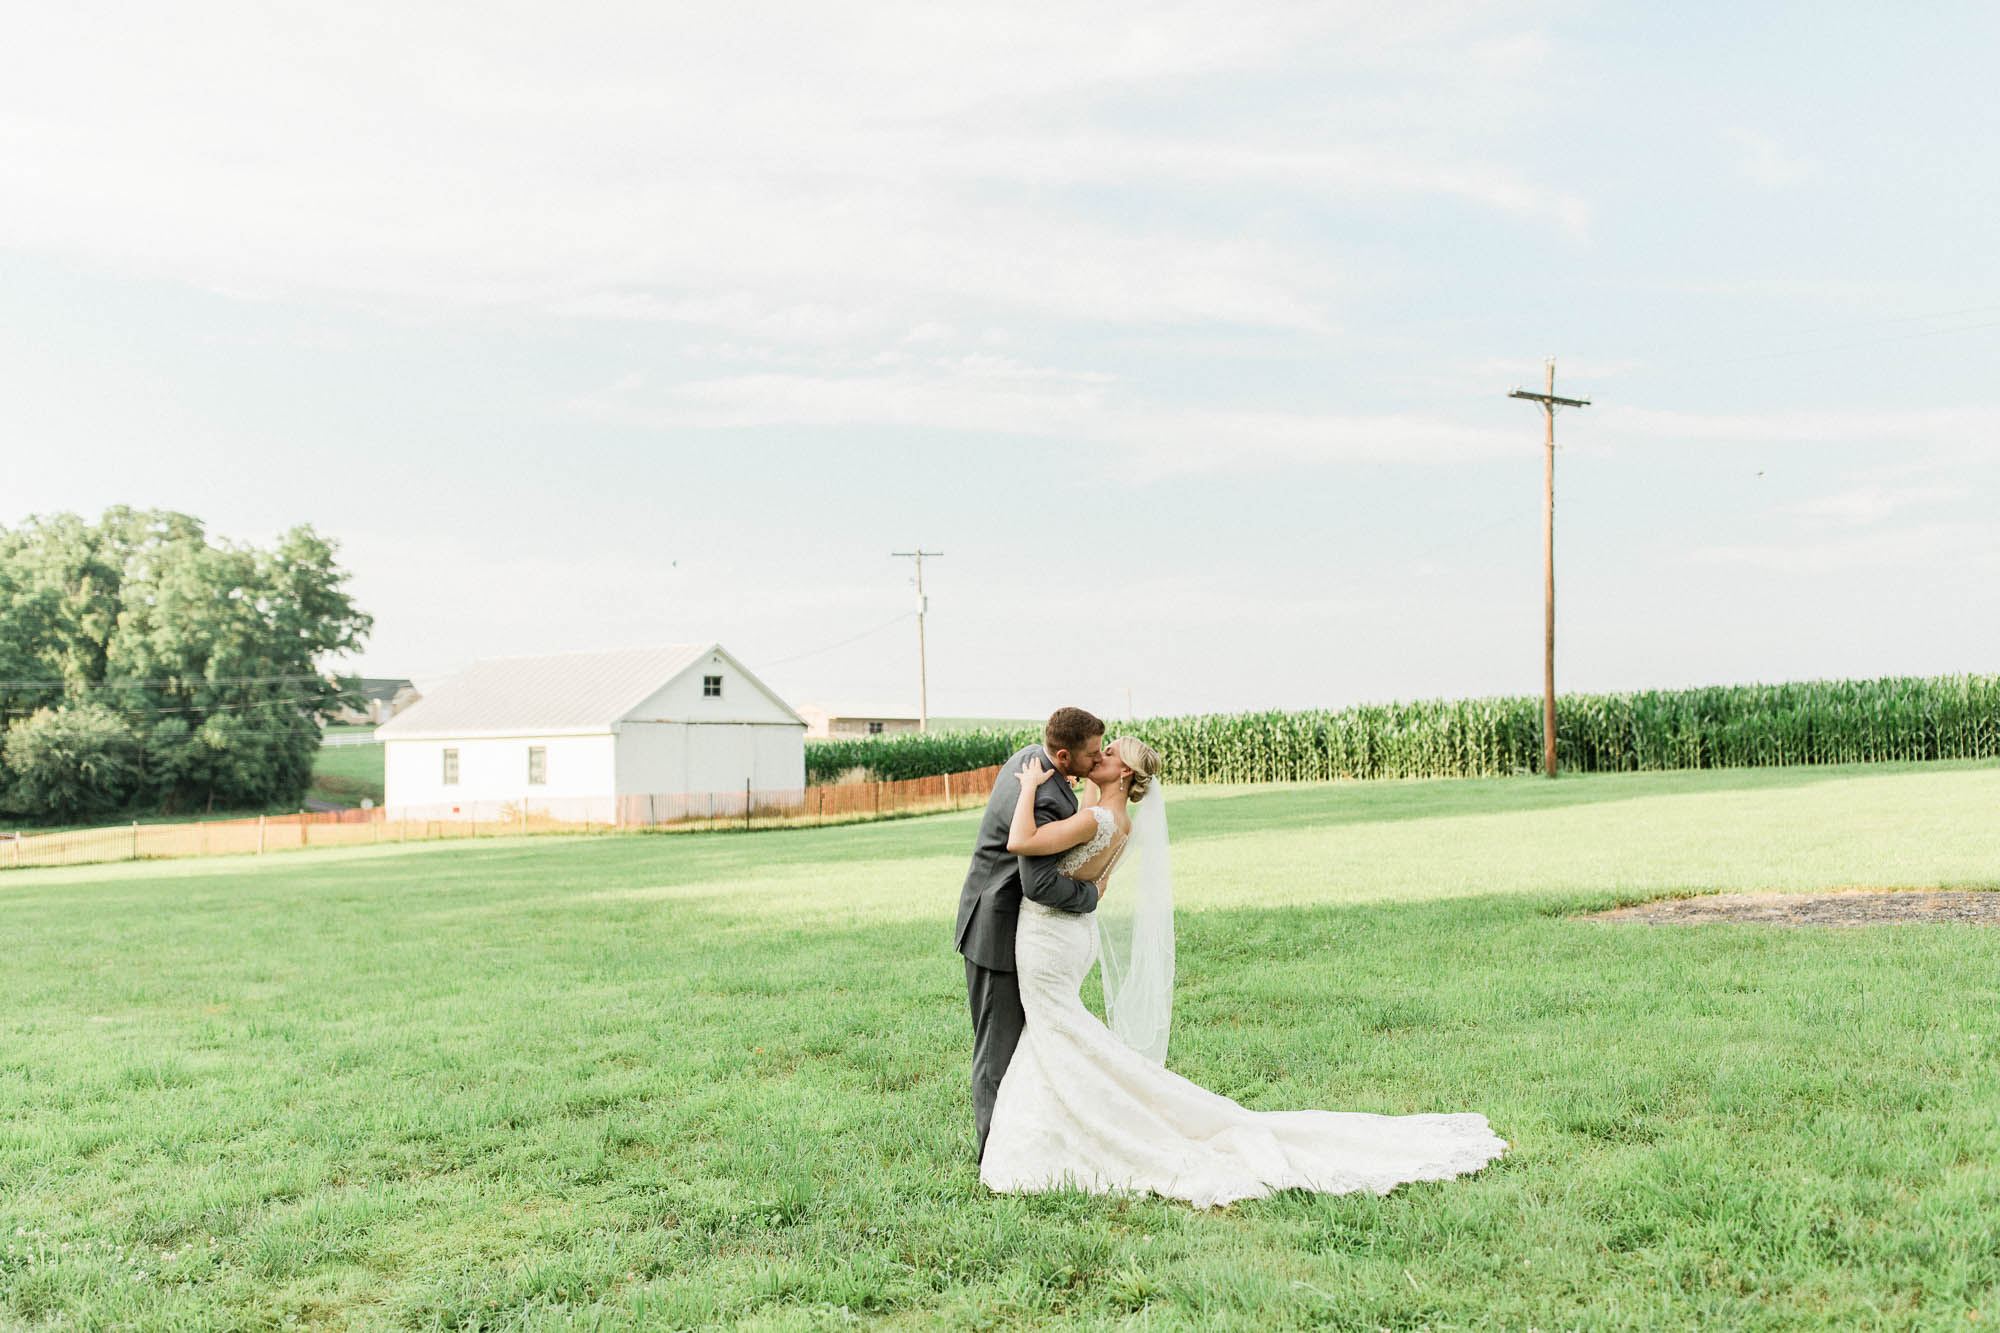 Allenberry-resort-historic-pennsylvania-wedding-10300.jpg